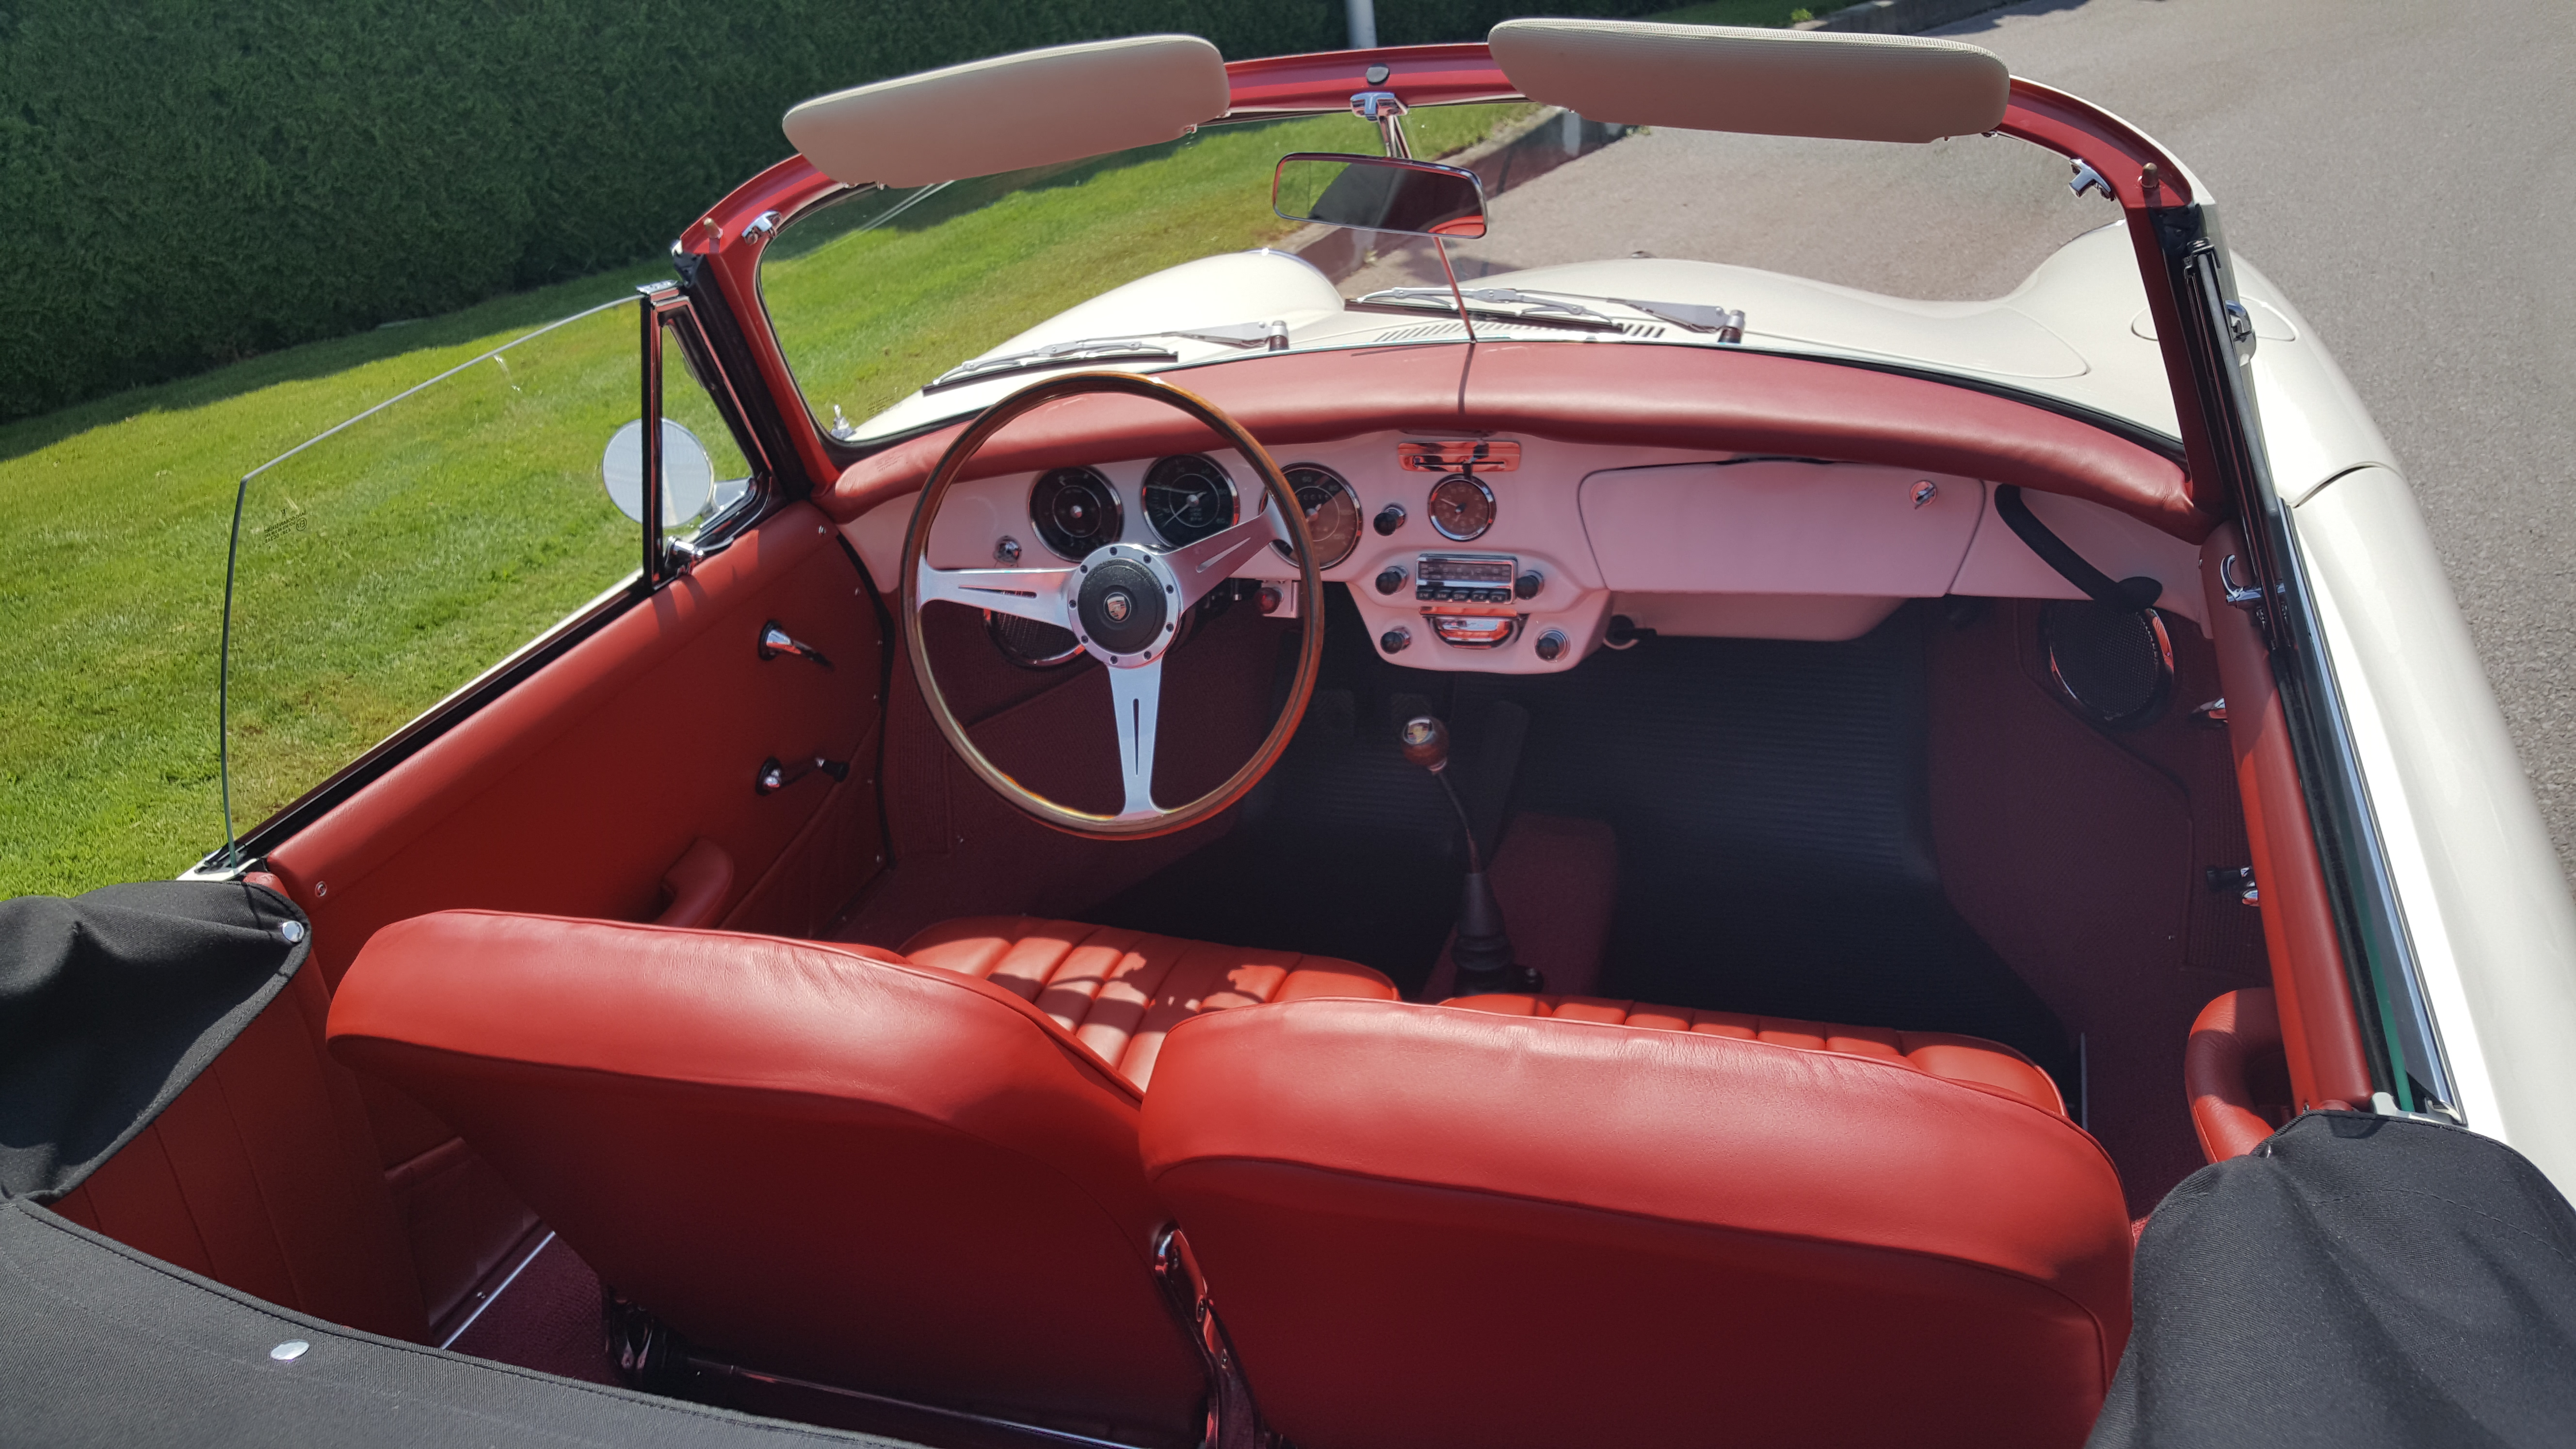 fp-car-sl-porsche 356 c cabriolet-07